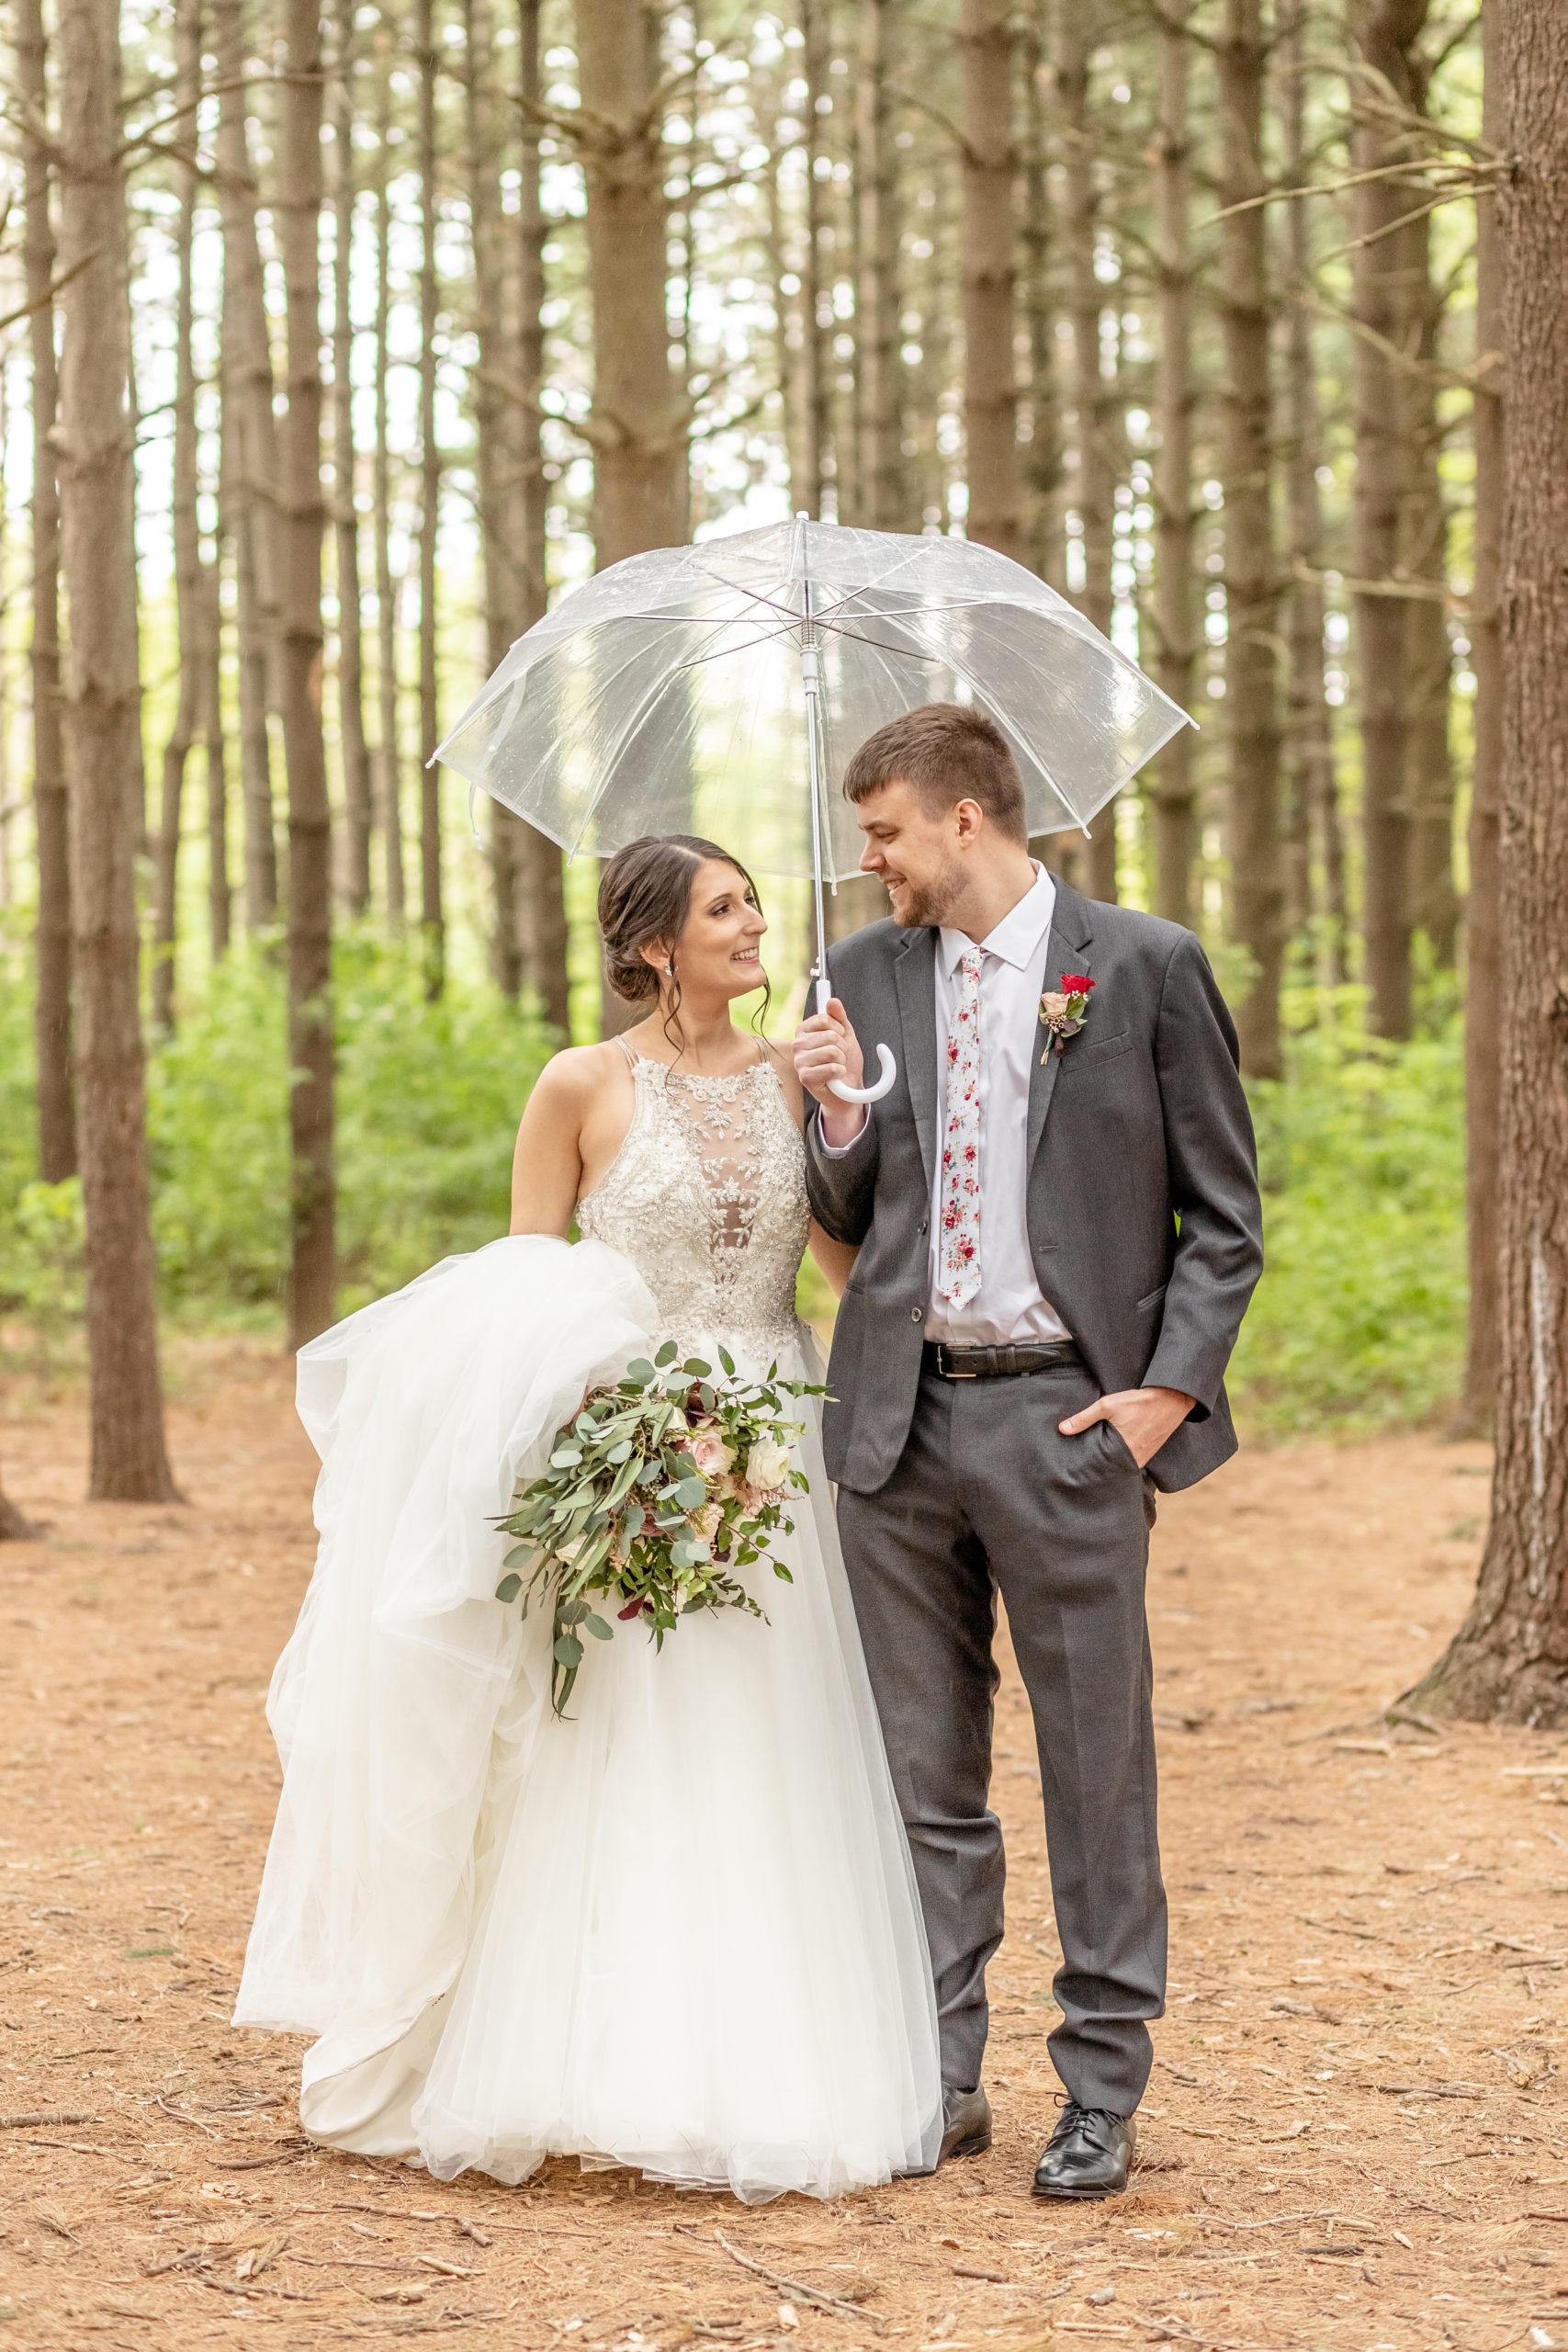 umbrella, see-through umbrella, wedding dress with long train,southern illinois photography